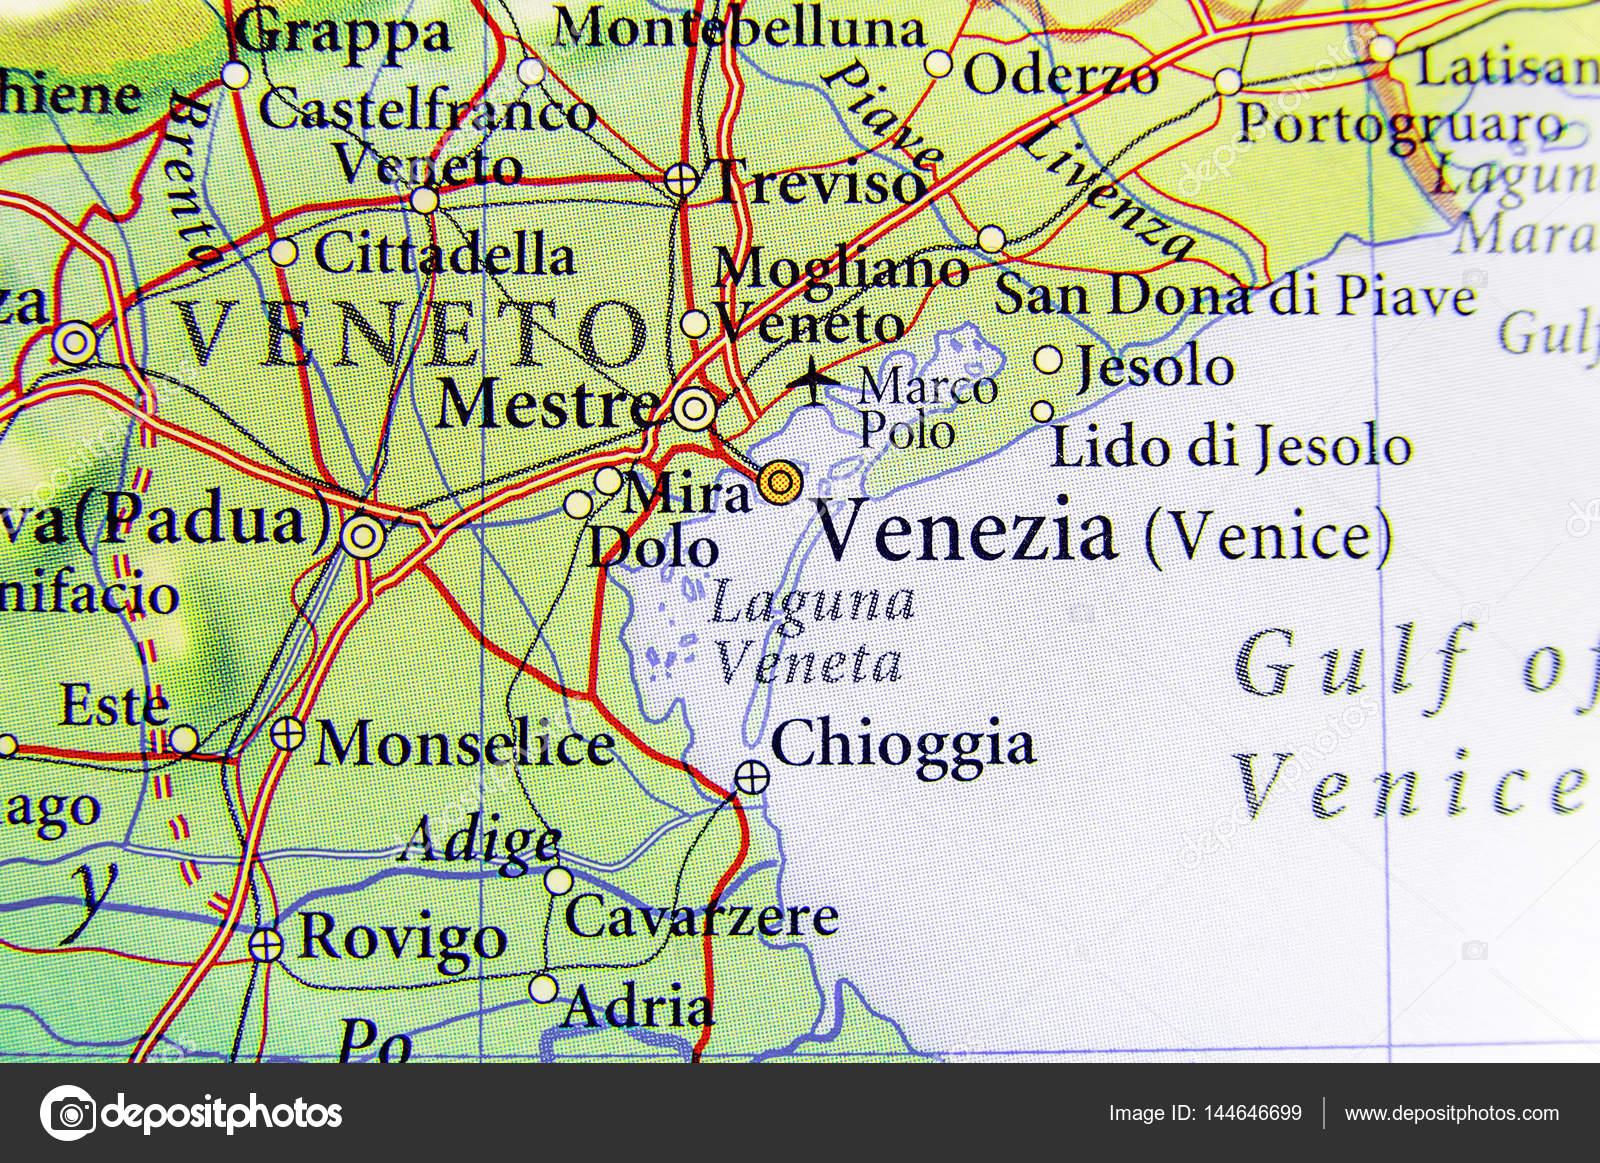 Cartina Topografica Venezia.Geographic Map Of European Country Italy With Venezia City Stock